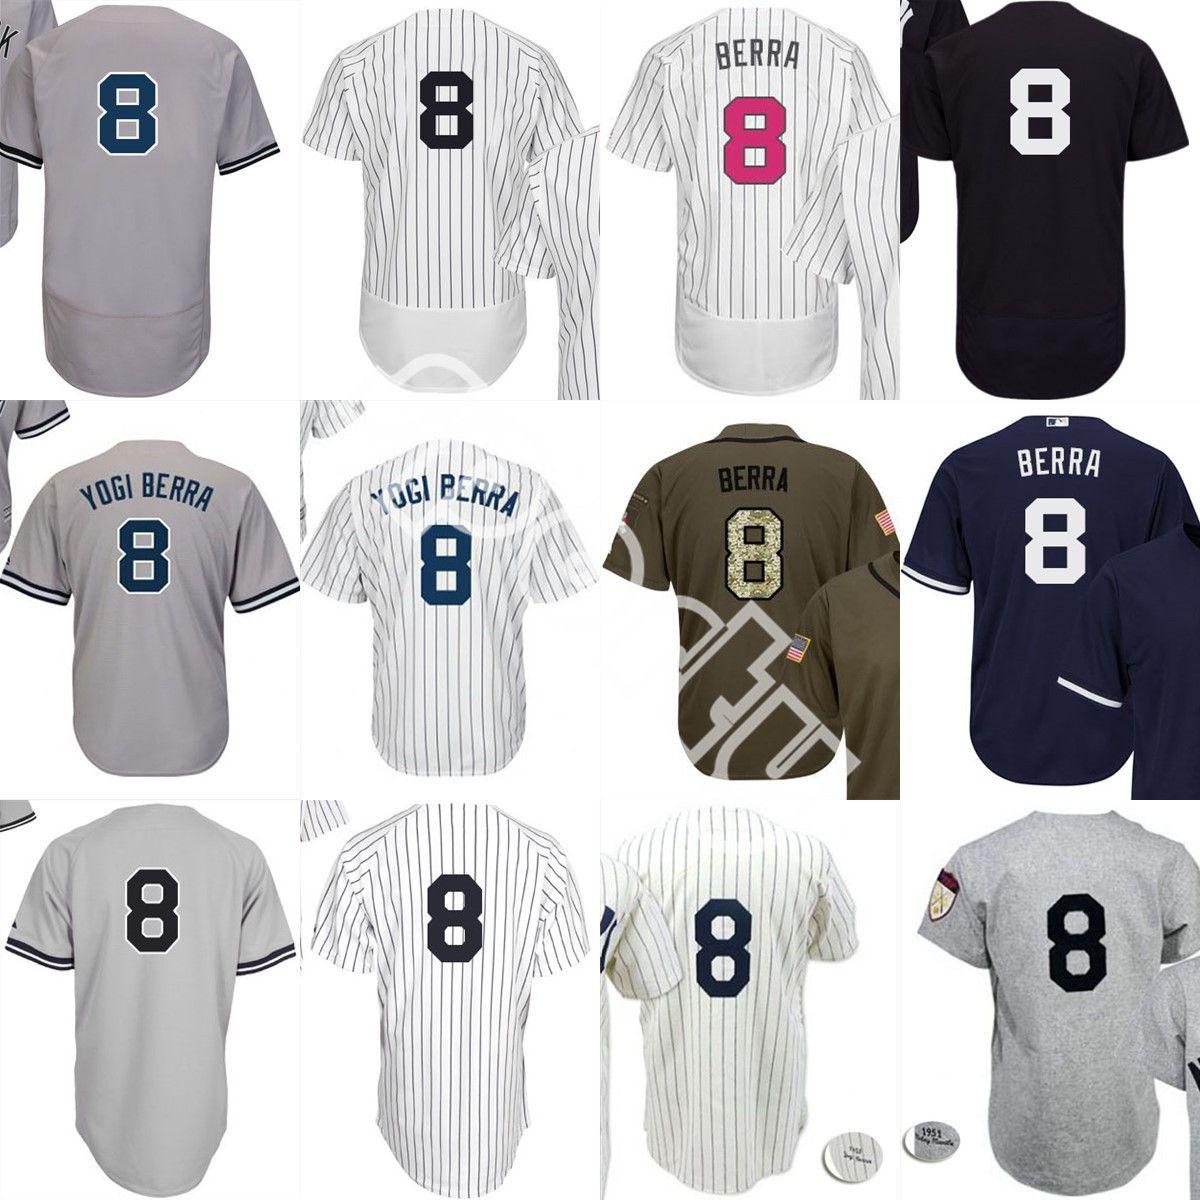 46453047e 2019 Men White Grey Navy 1951 8 Yogi Berra Baseball Jersey Mitchell And Ness  Salute To Service New York NYY Home Road Jerseys From Sporty